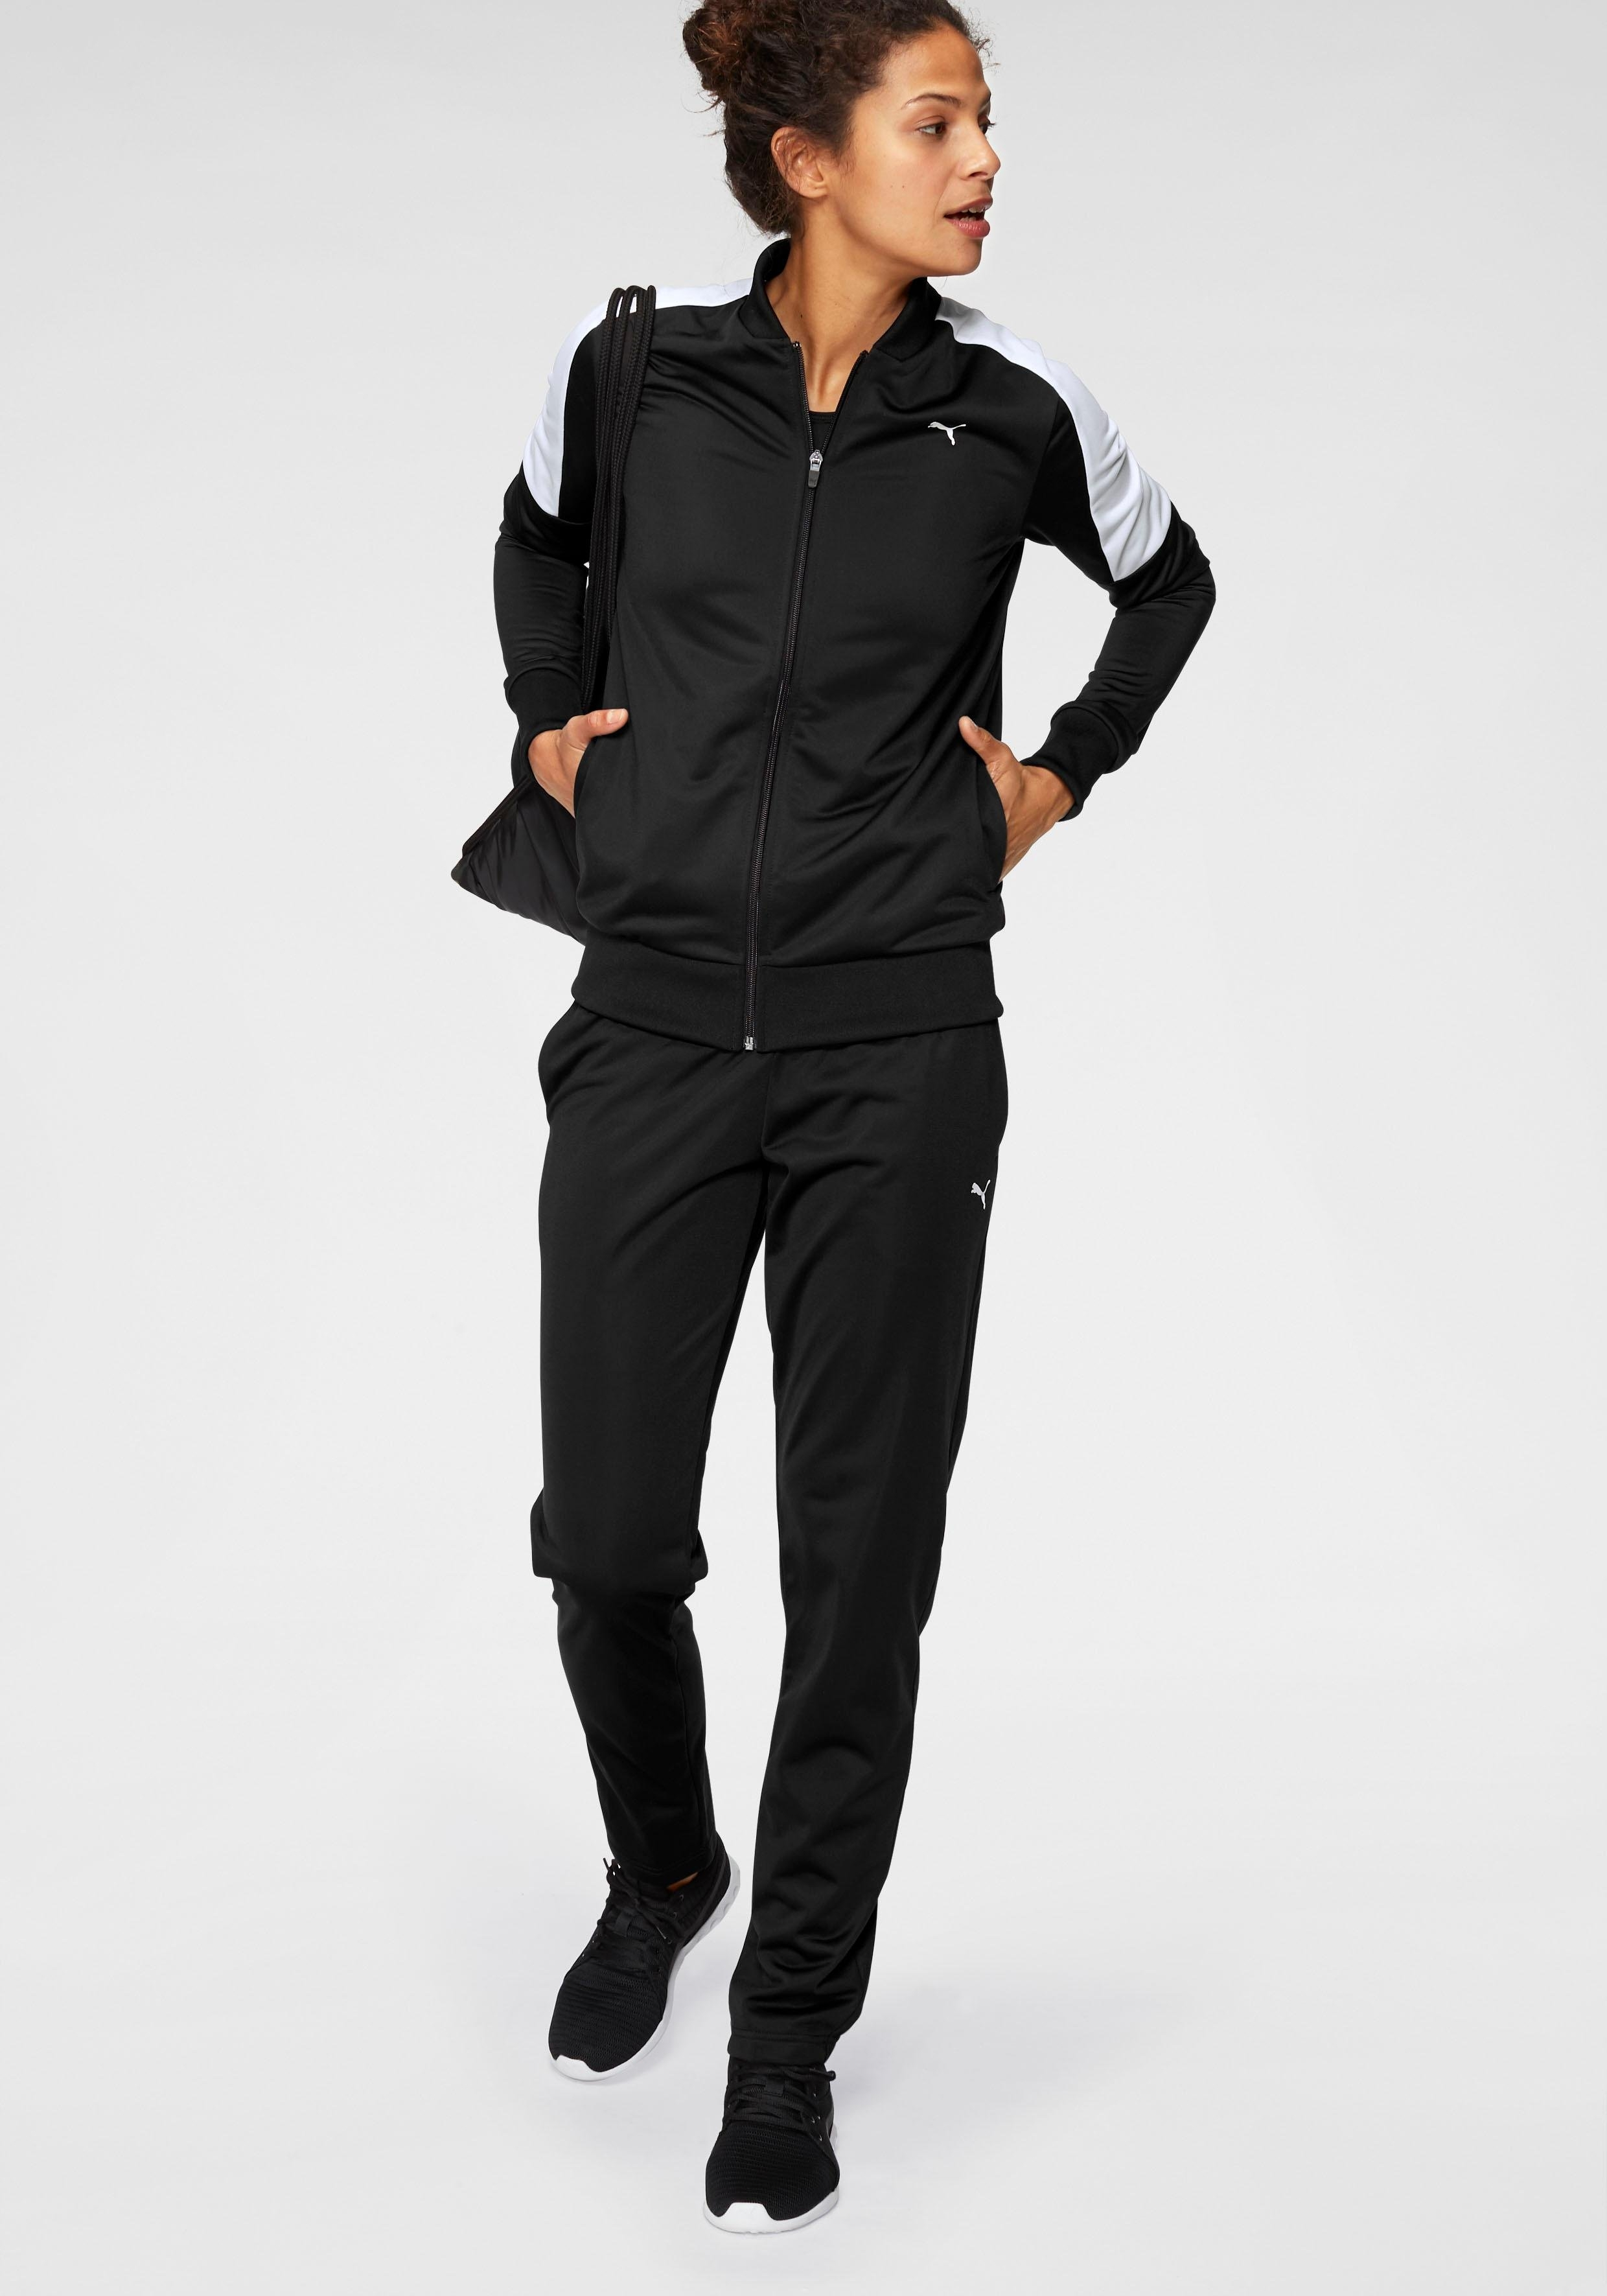 OpBestel Trainingspakclean Suit Bij Tricot Nu Puma 2IHE9WD